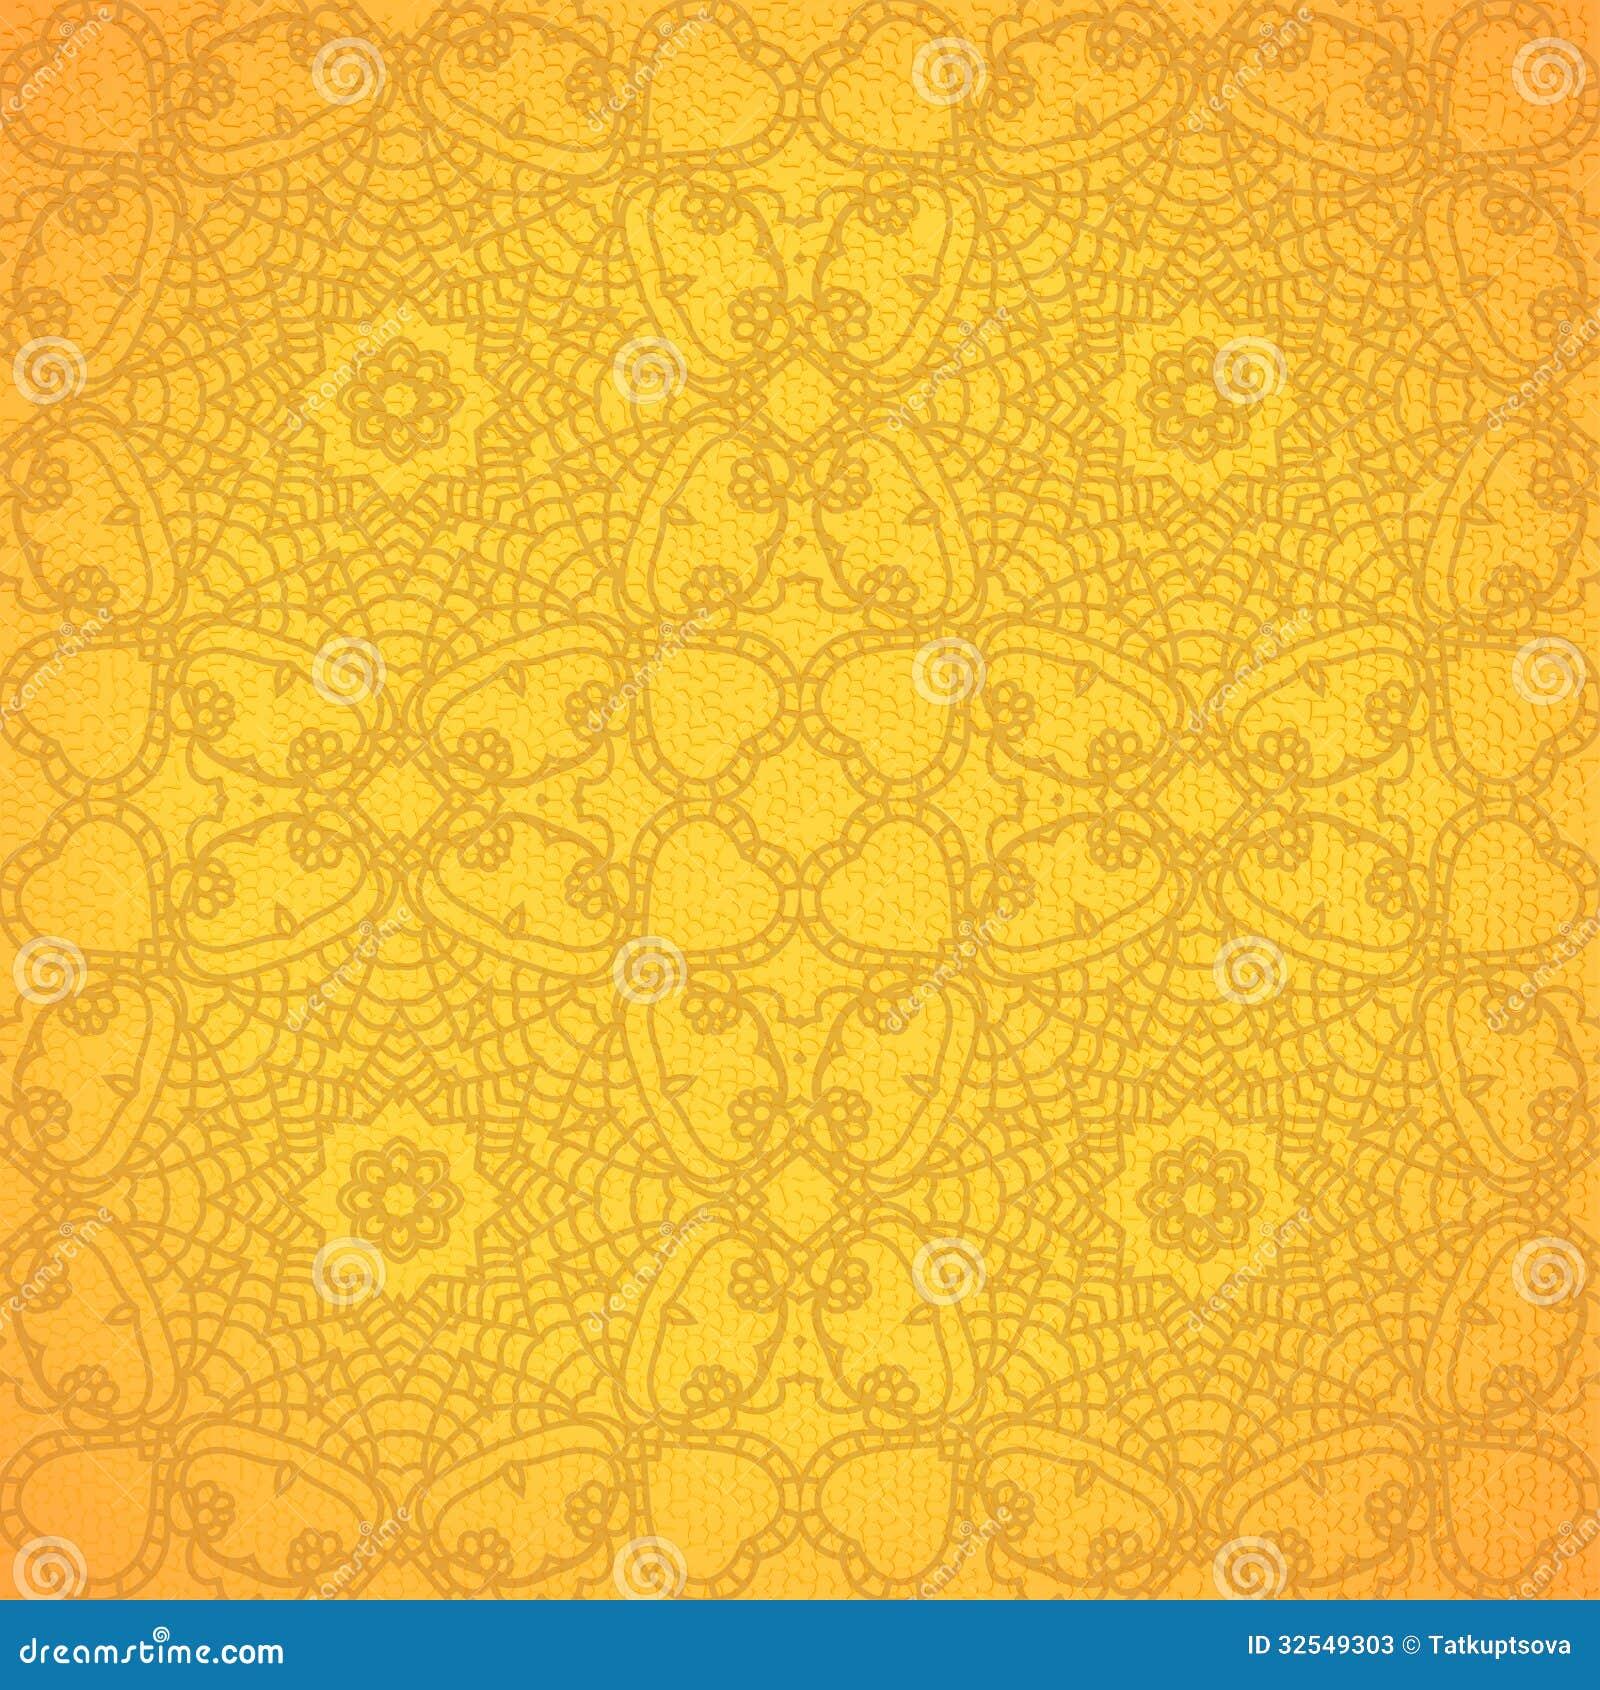 Elegant Indian ornamentation on a dark background. Stylish design. Can ...